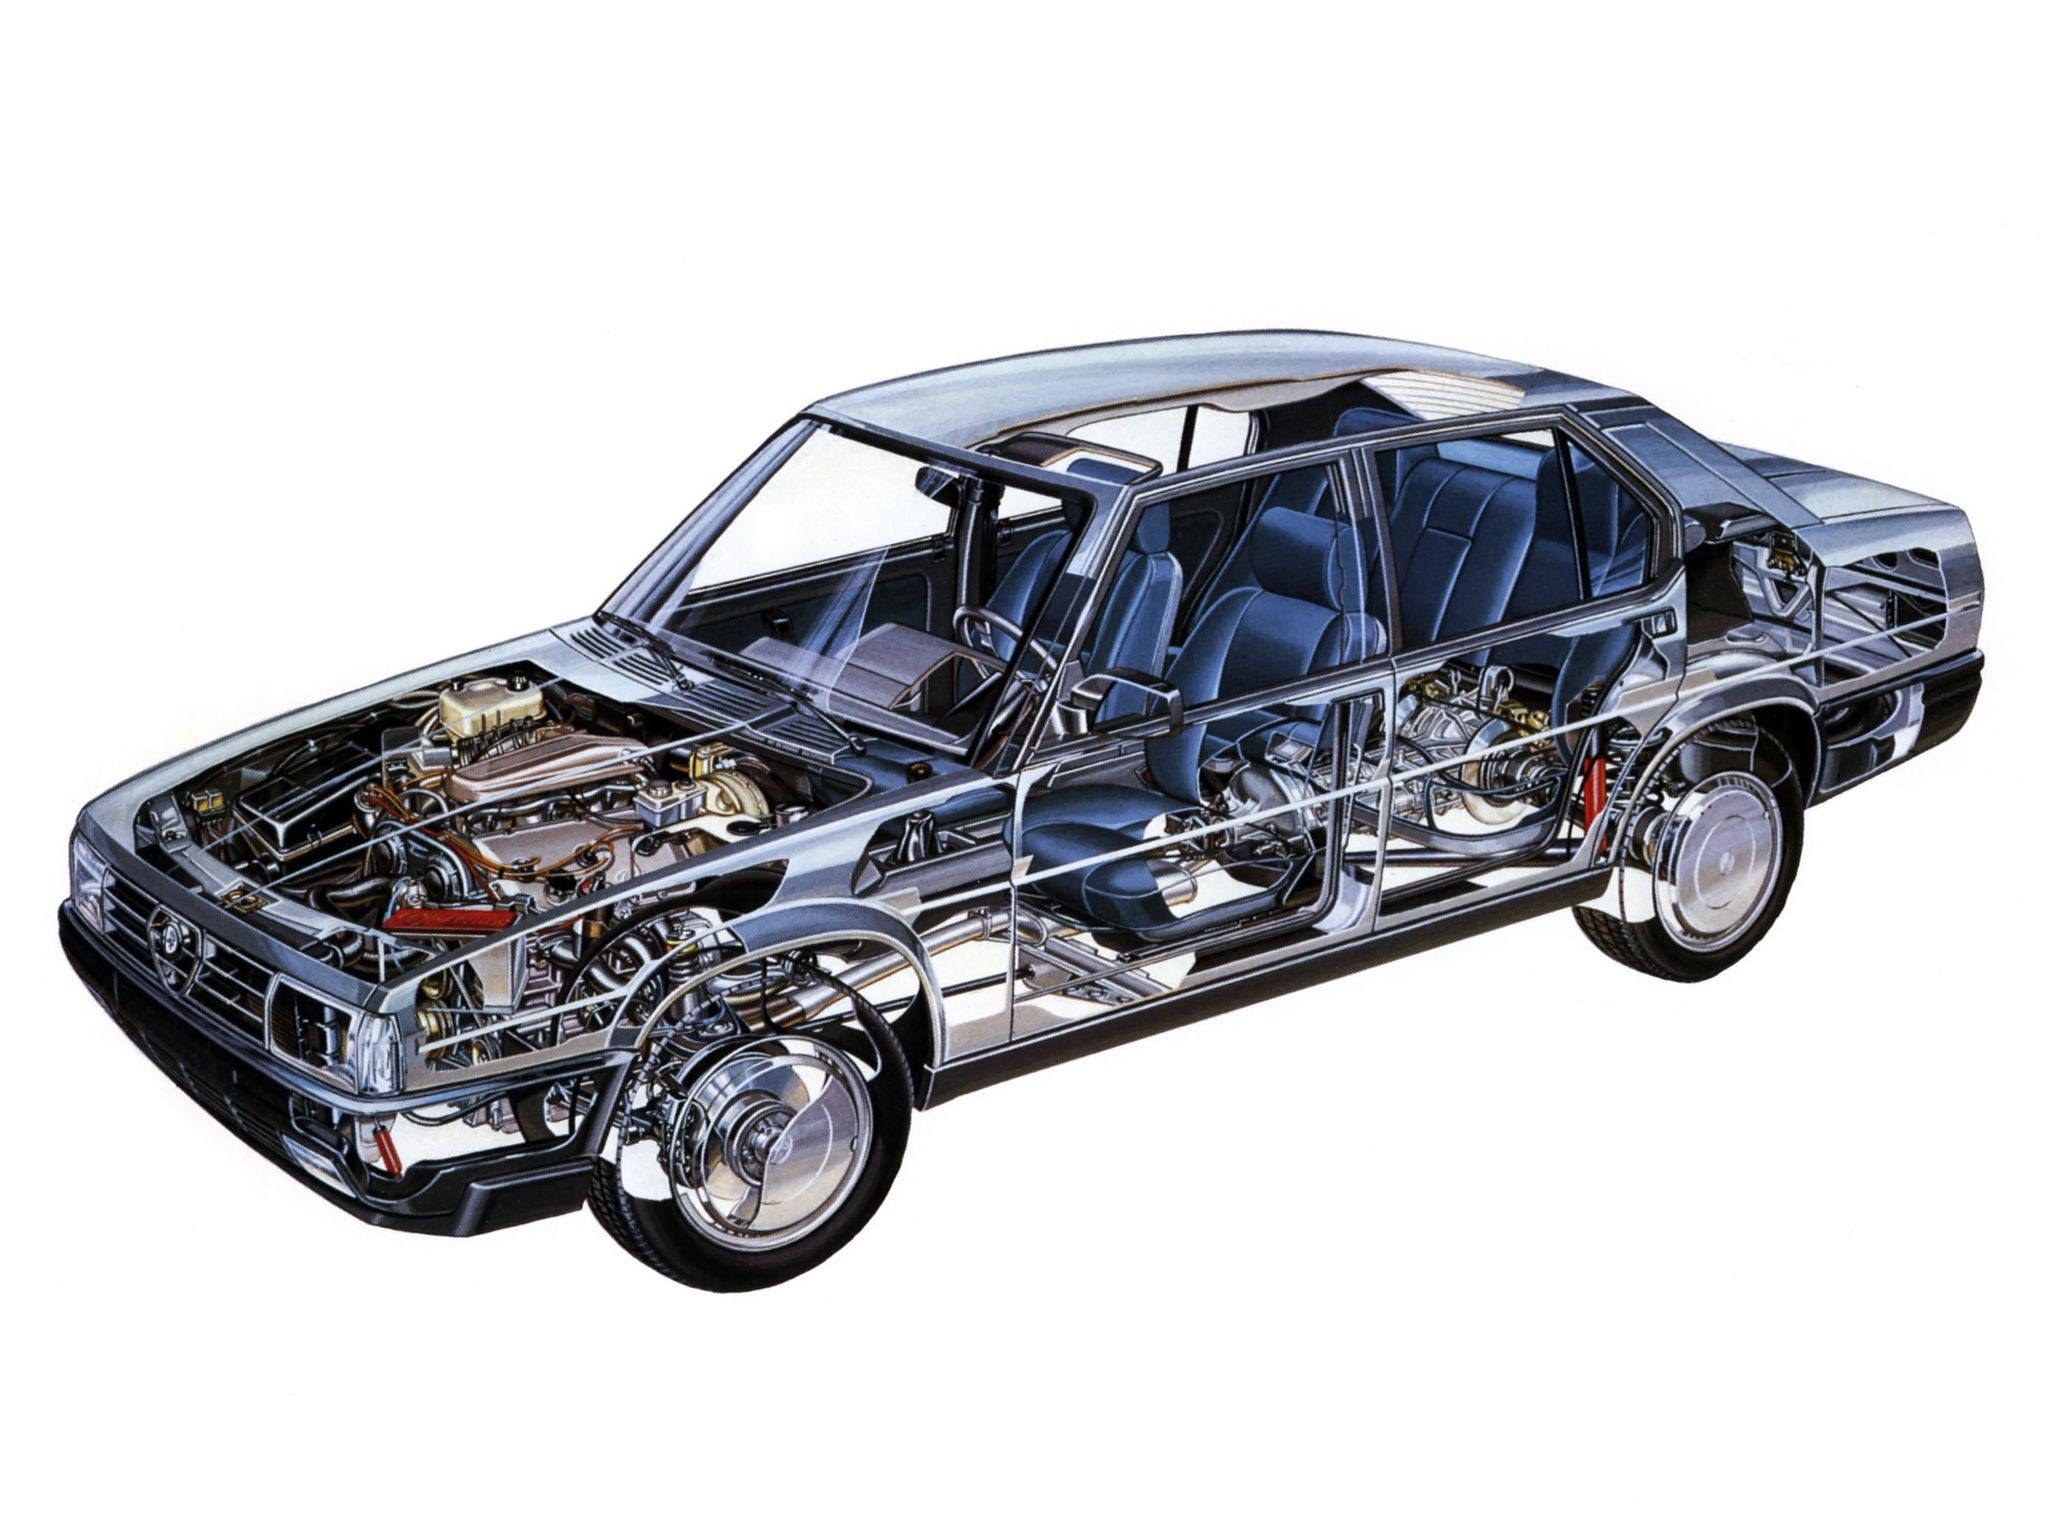 Alfa Romeo 90 cutaway